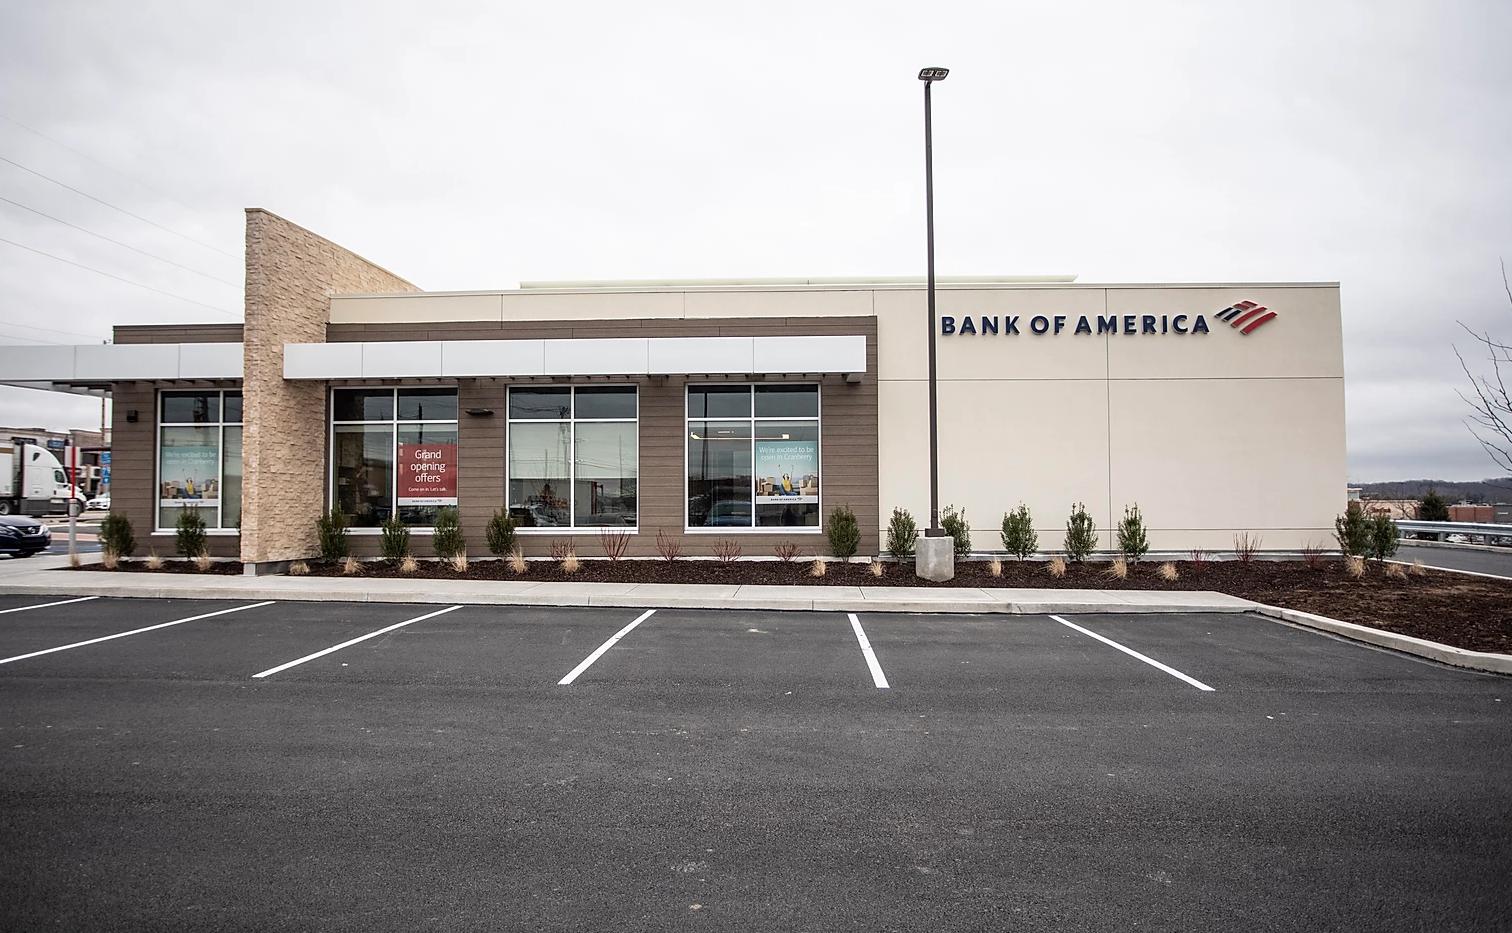 BANK OF AMERICA CRANBERRY